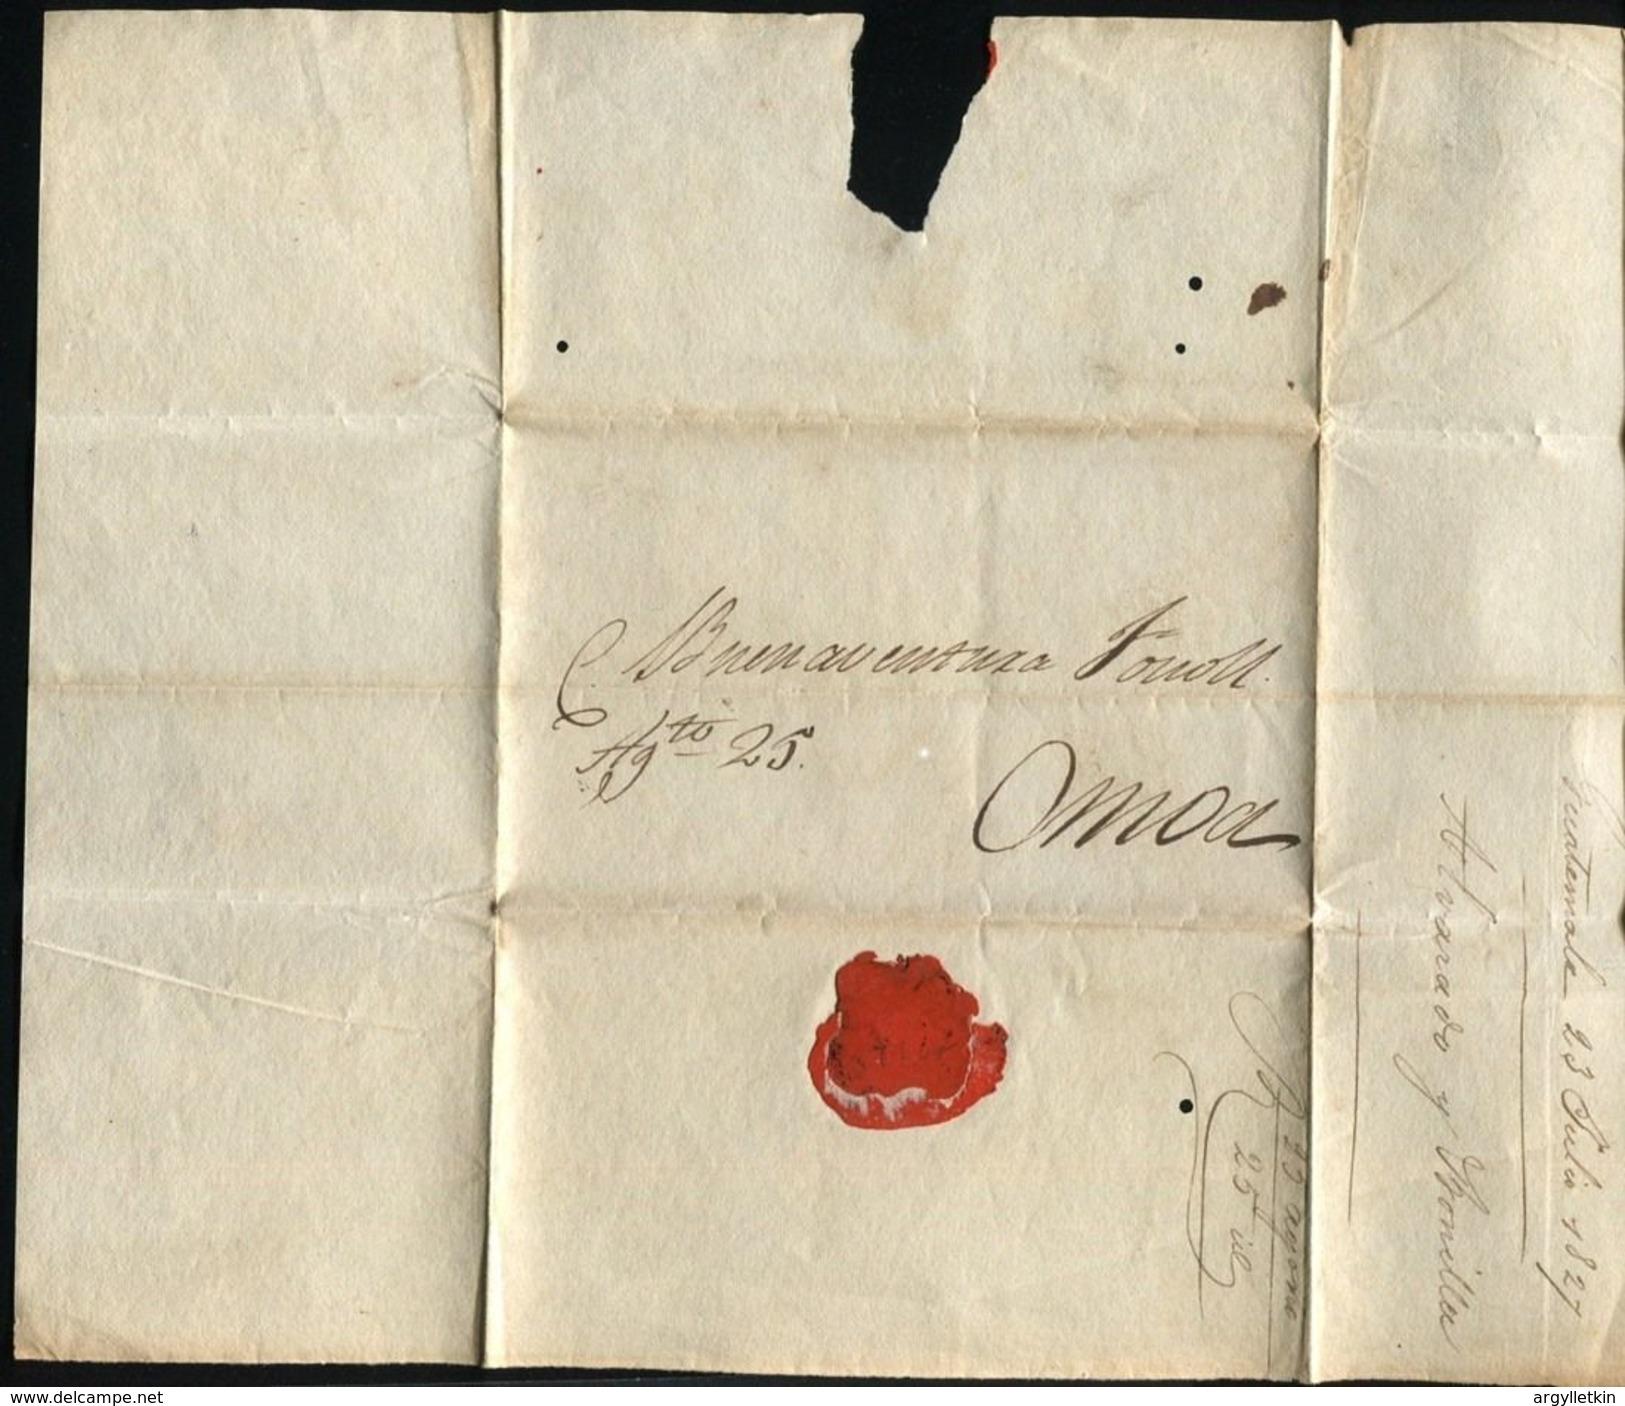 GUATEMALA WRAPPER 1827 OMOA - Guatemala